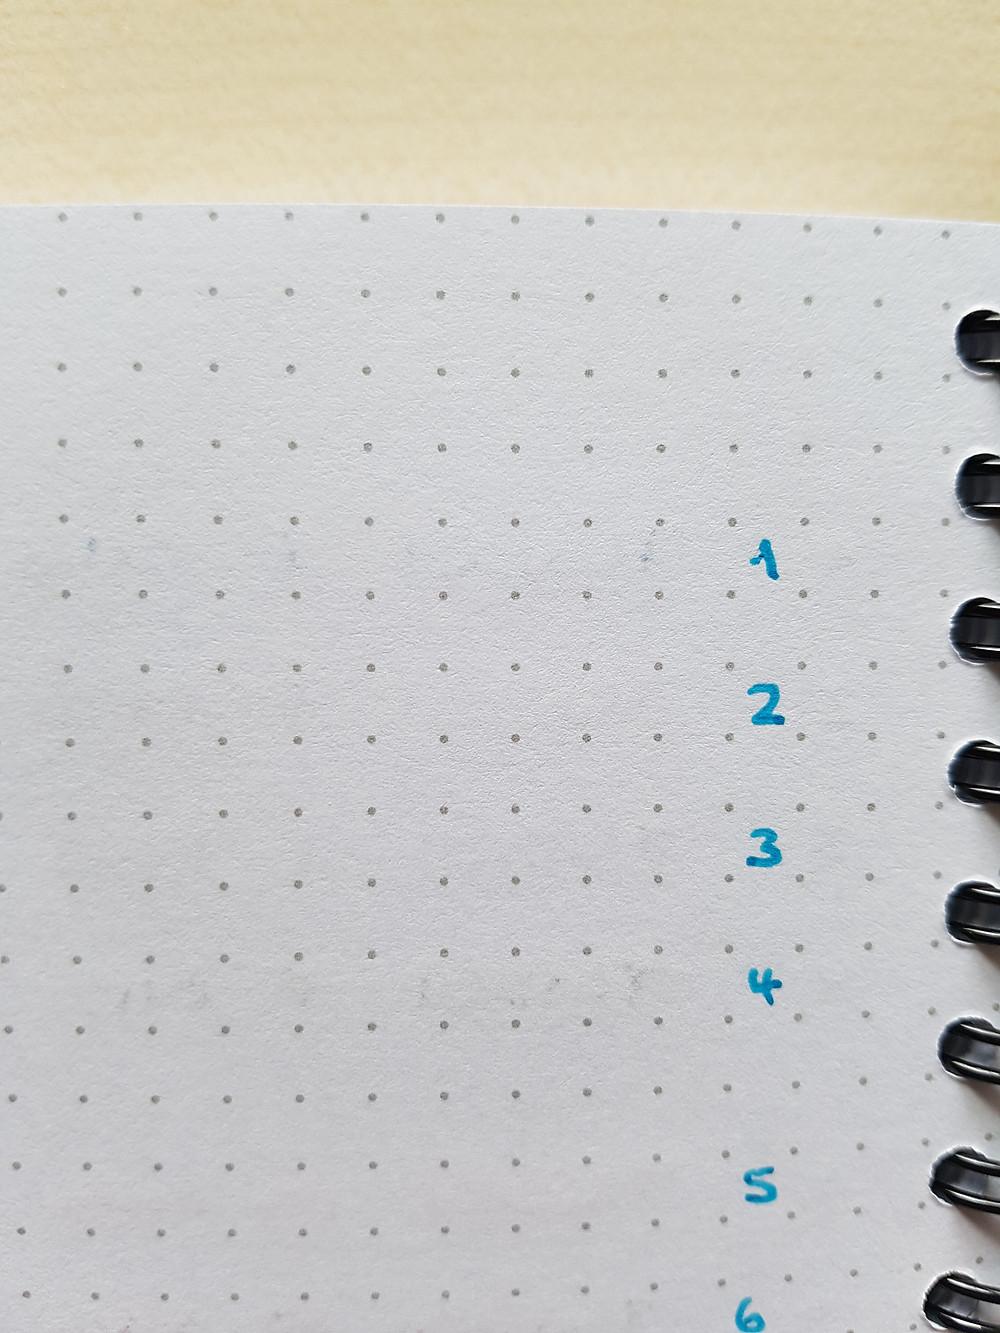 StickersSwissMade - blogpost - paper and pen test nbr 4 -  dotgrid.co notebooks_11